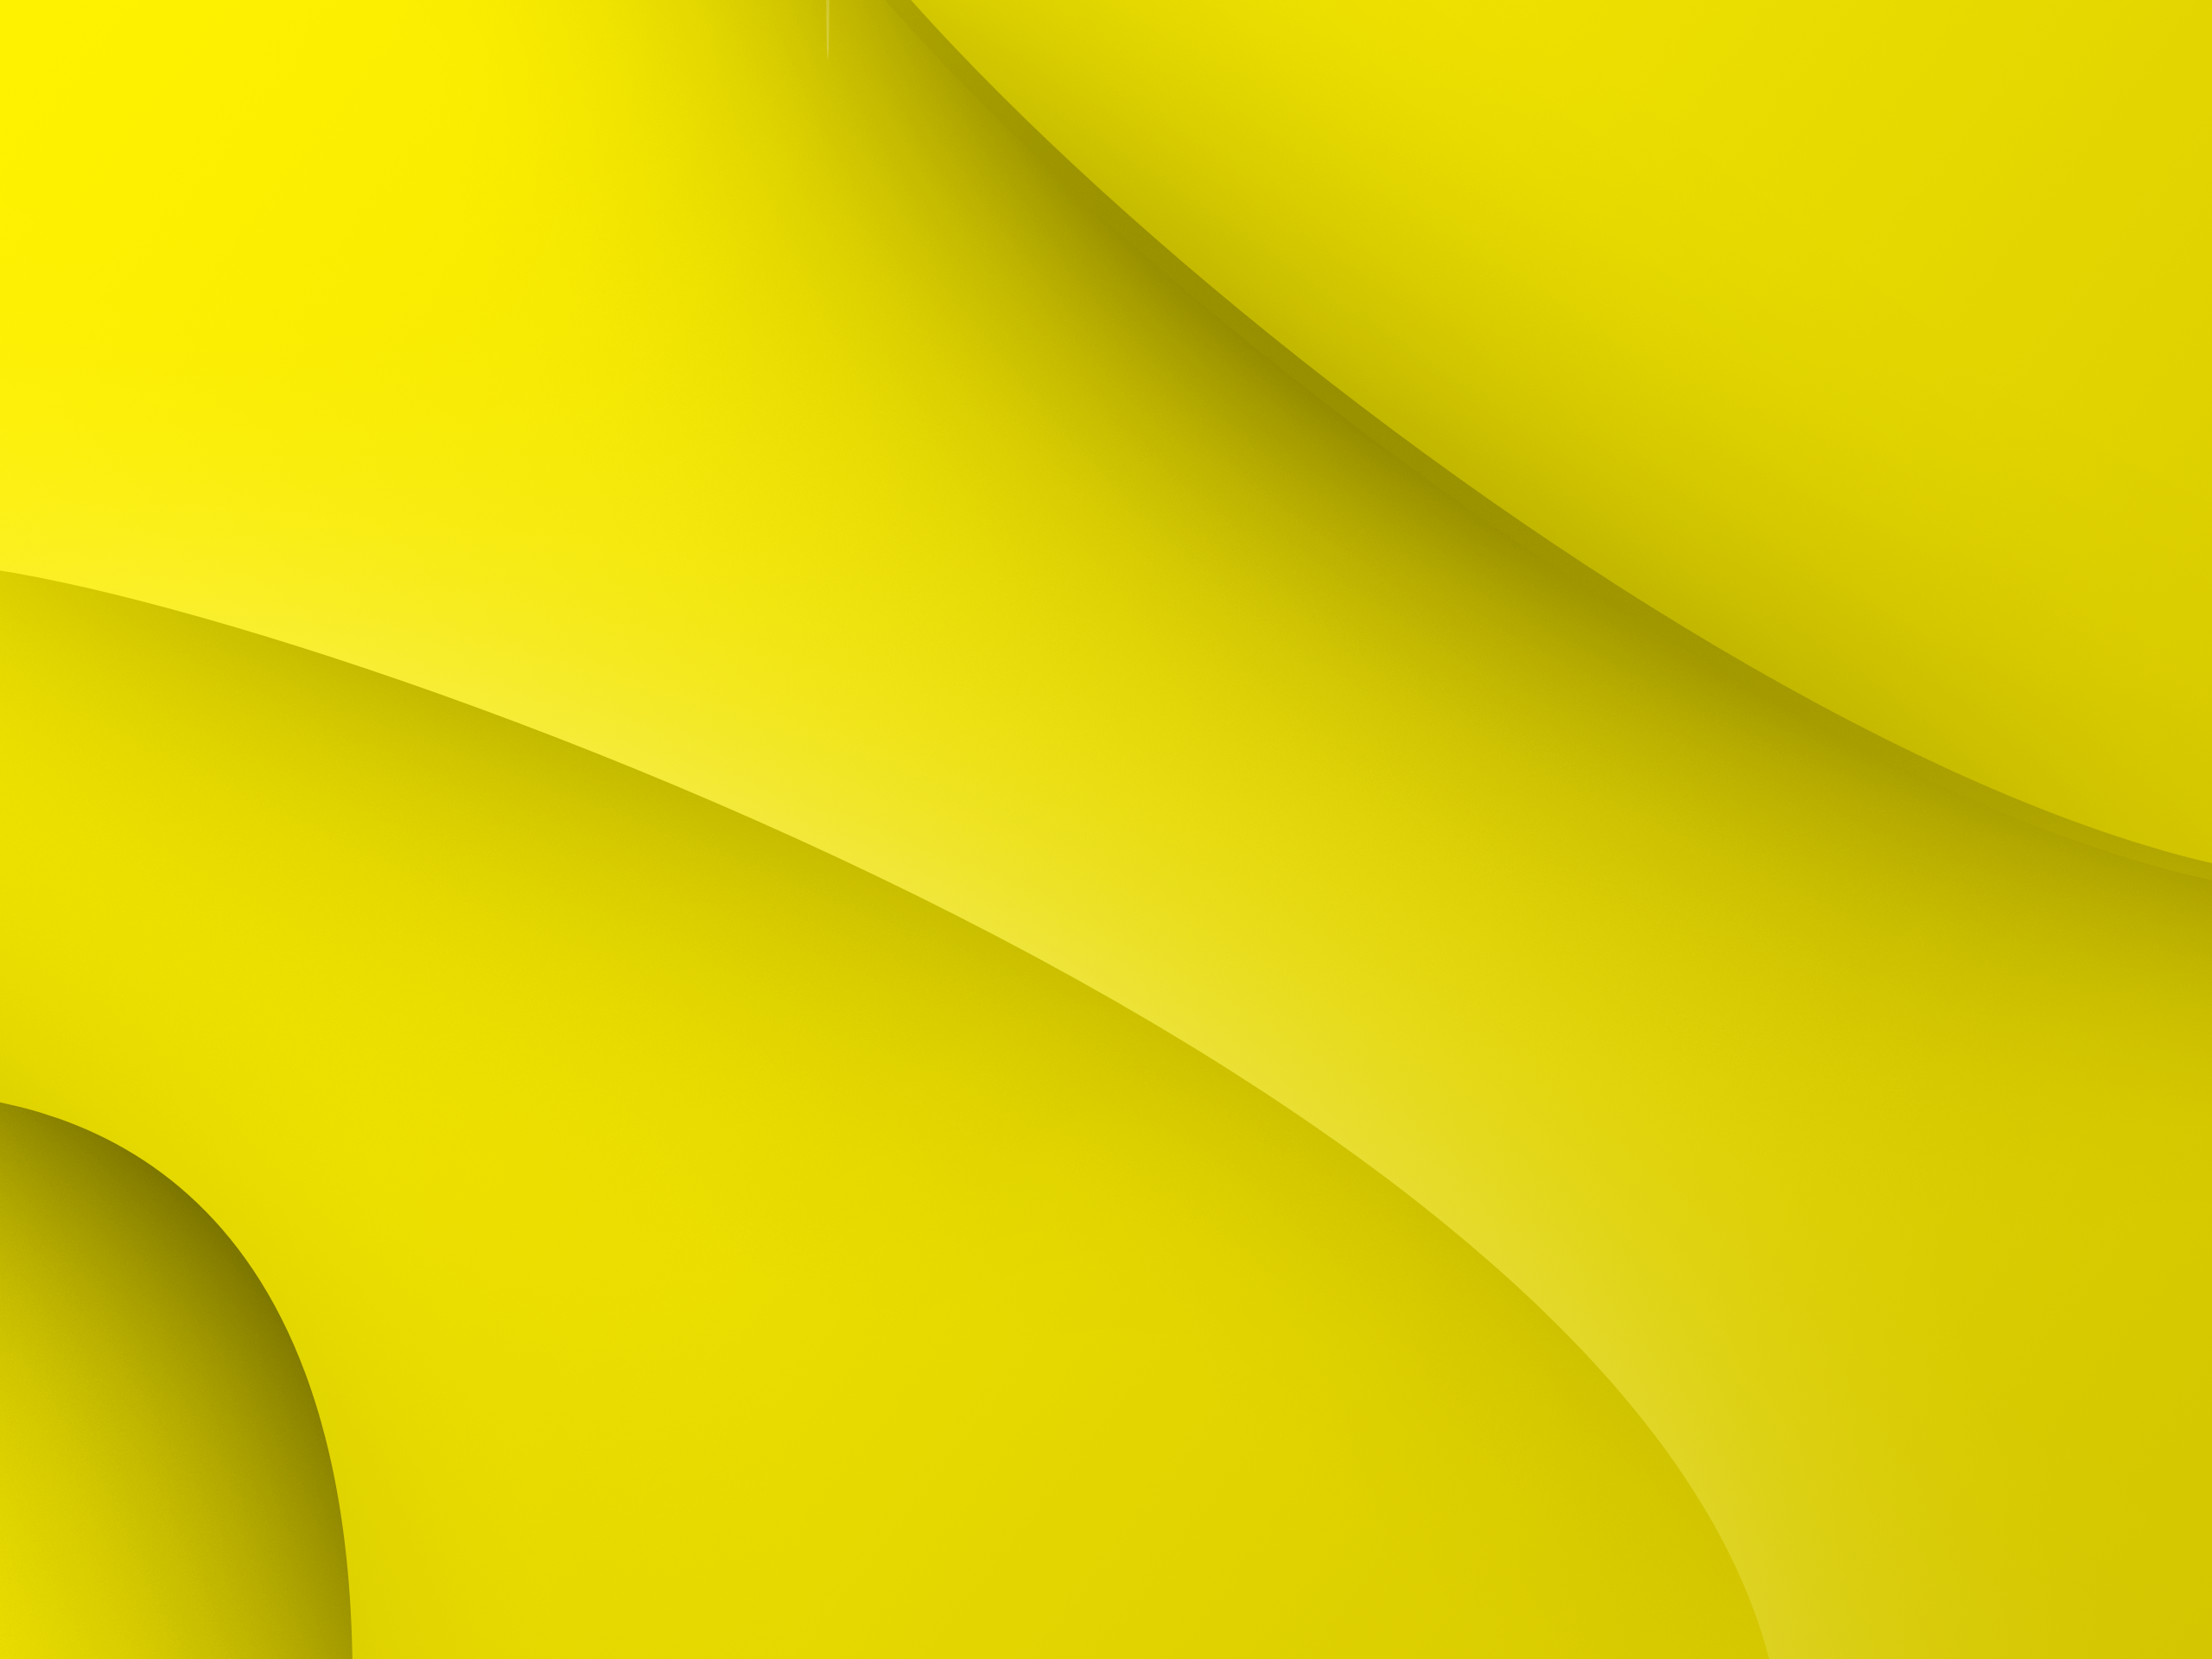 Amazing Yellow Wave Background